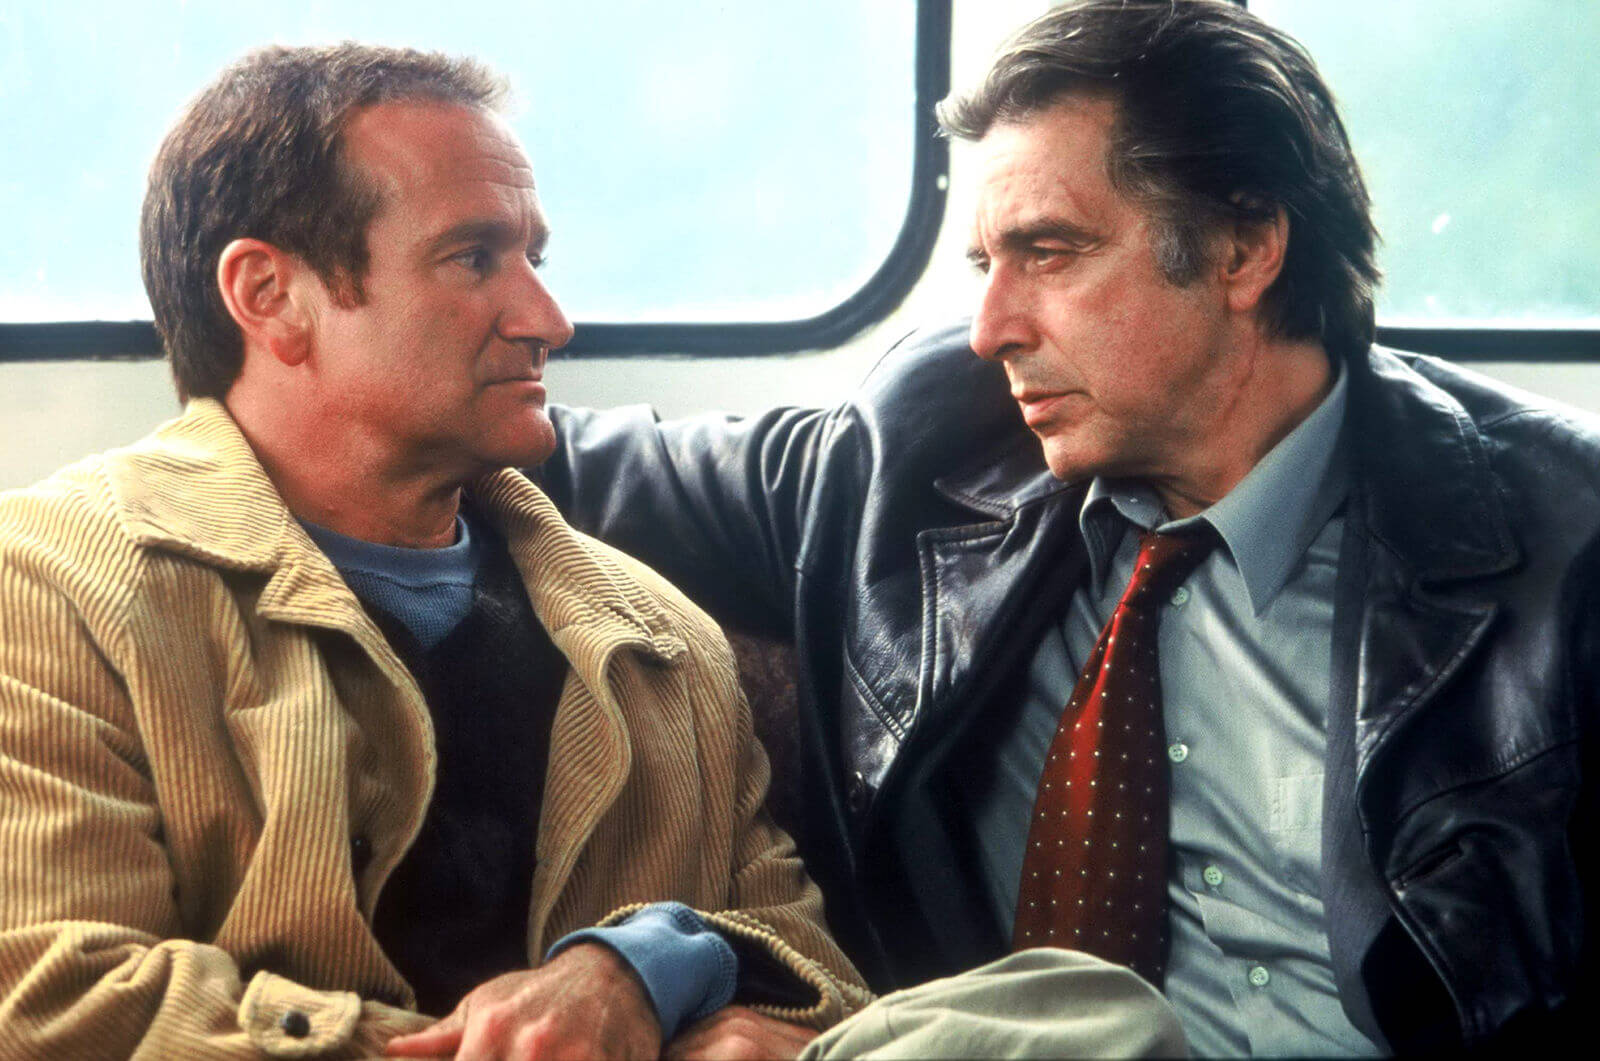 De la stanga: Robin Williams si Al Pacino